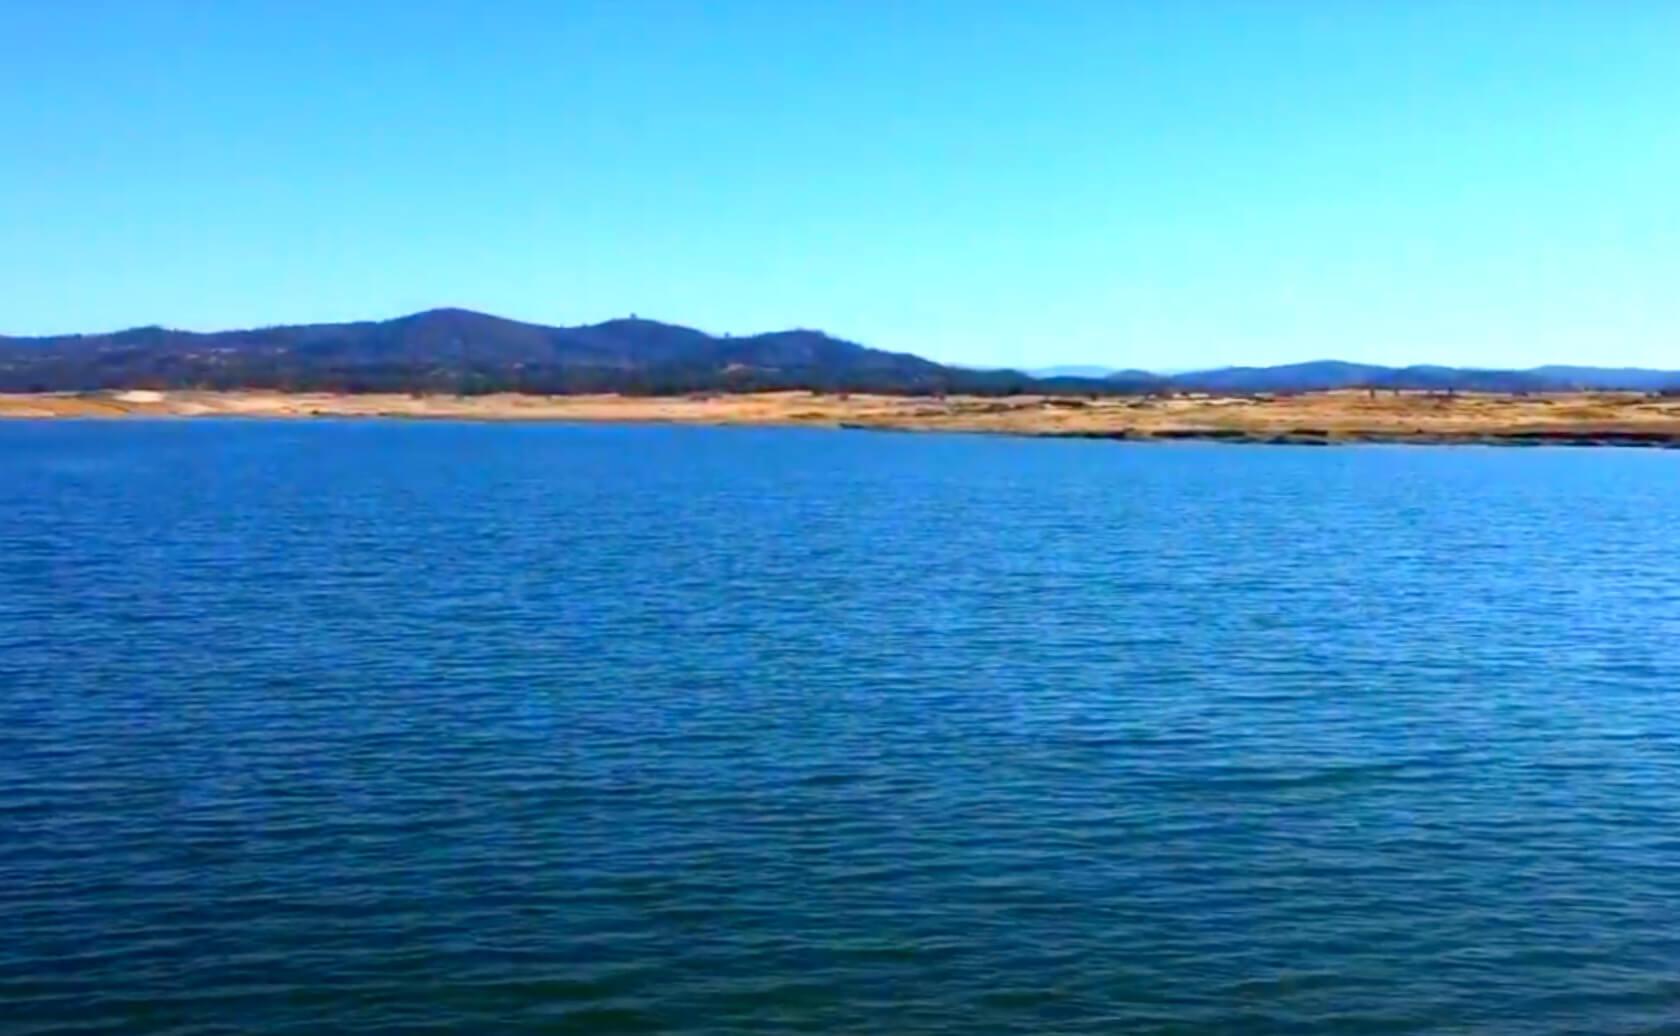 Folsom-LaFolsom-Lake-Reservoir-Fishing-Guide-Report-California-03ke-Reservoir-Fishing-Guide-Report-California-03